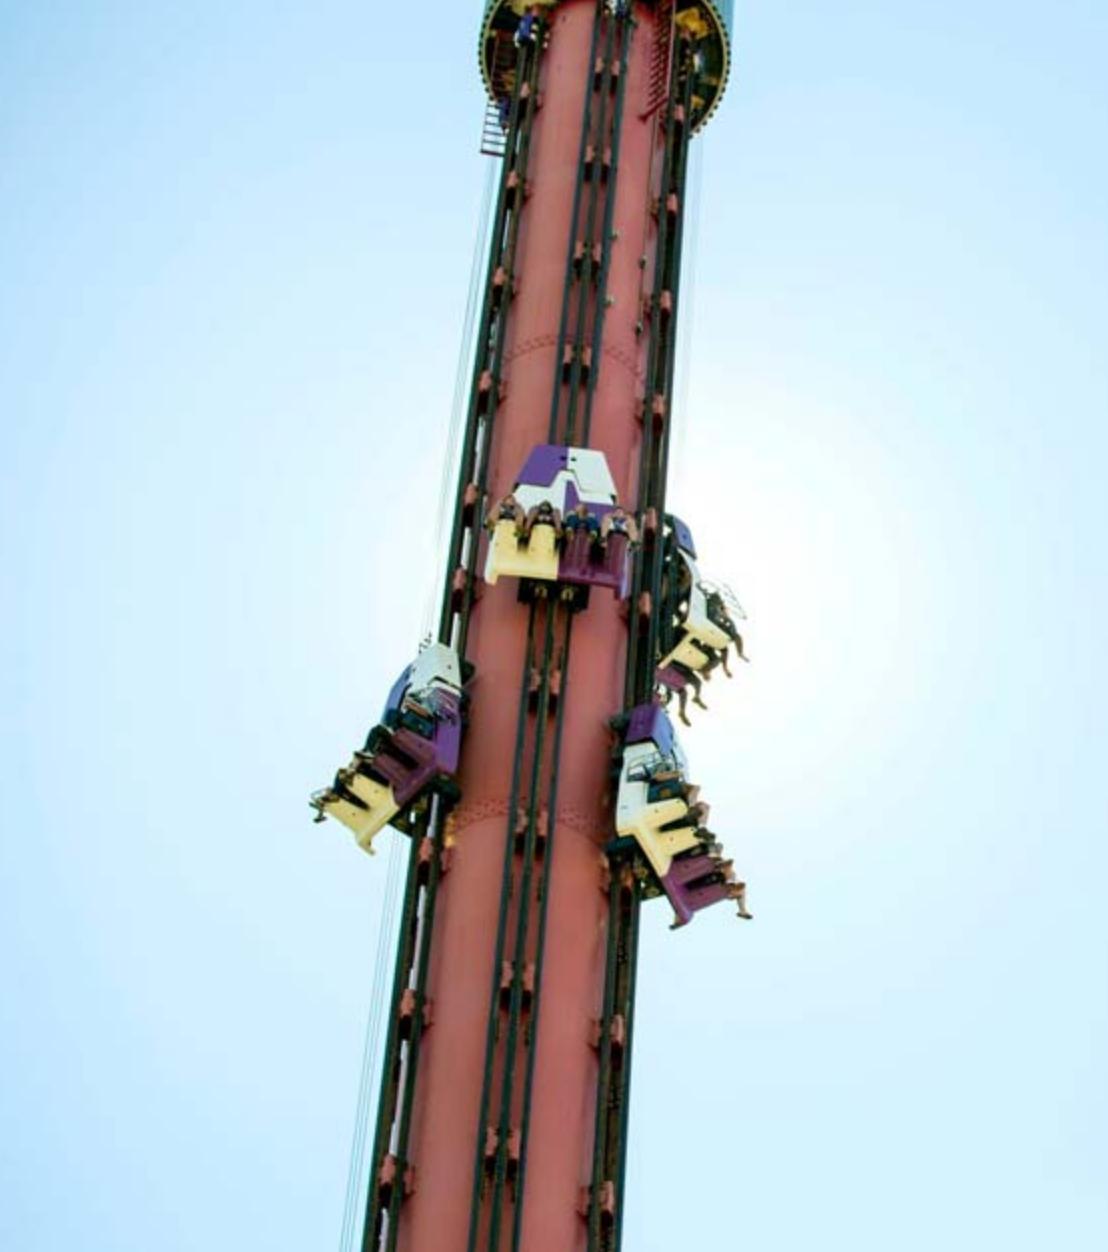 Heide park free fall tower